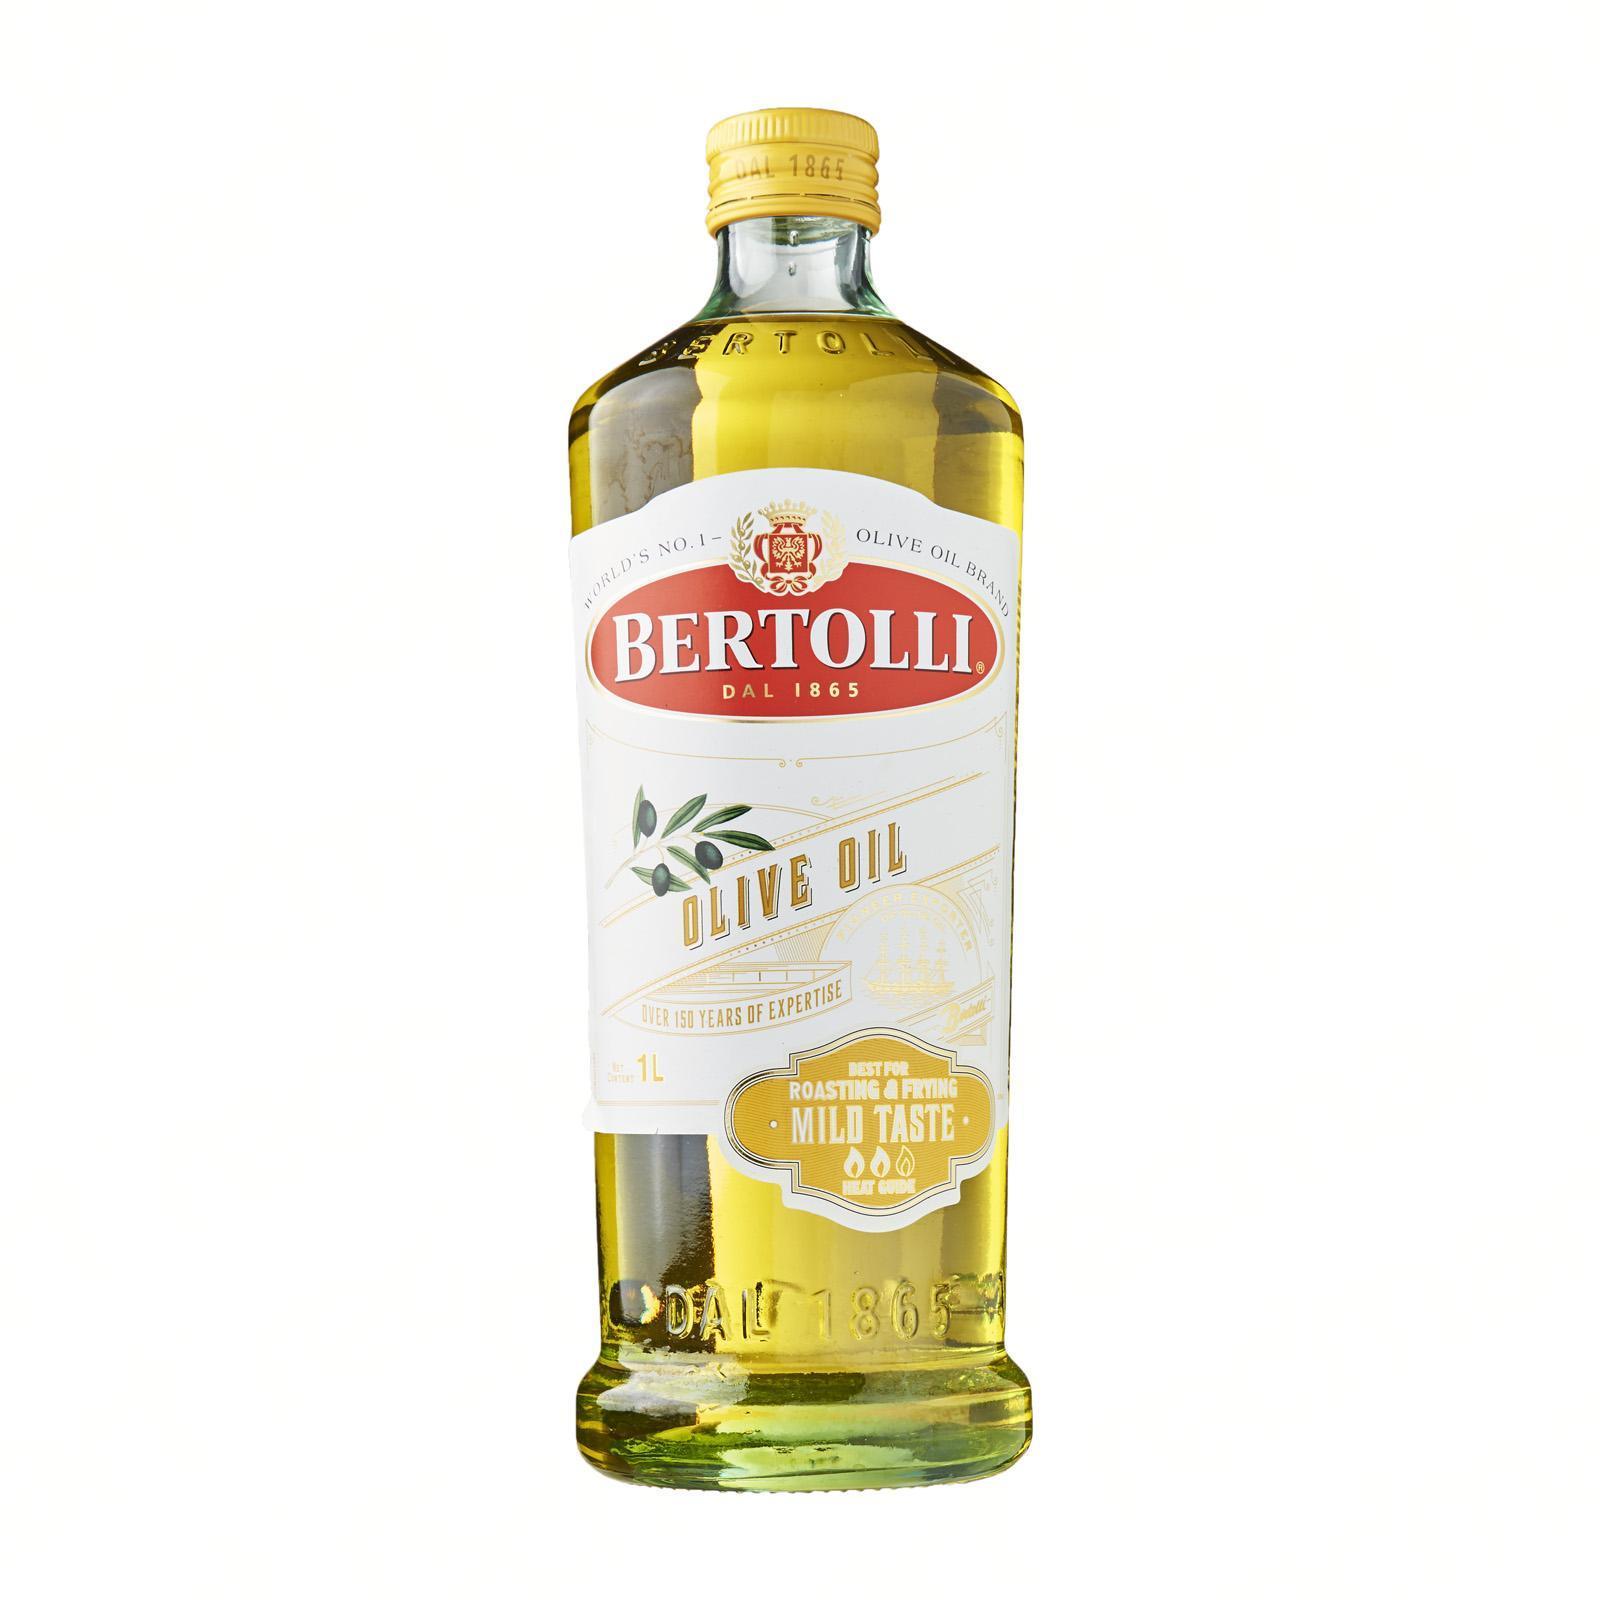 Bertolli Classico Olive Oil By Redmart.